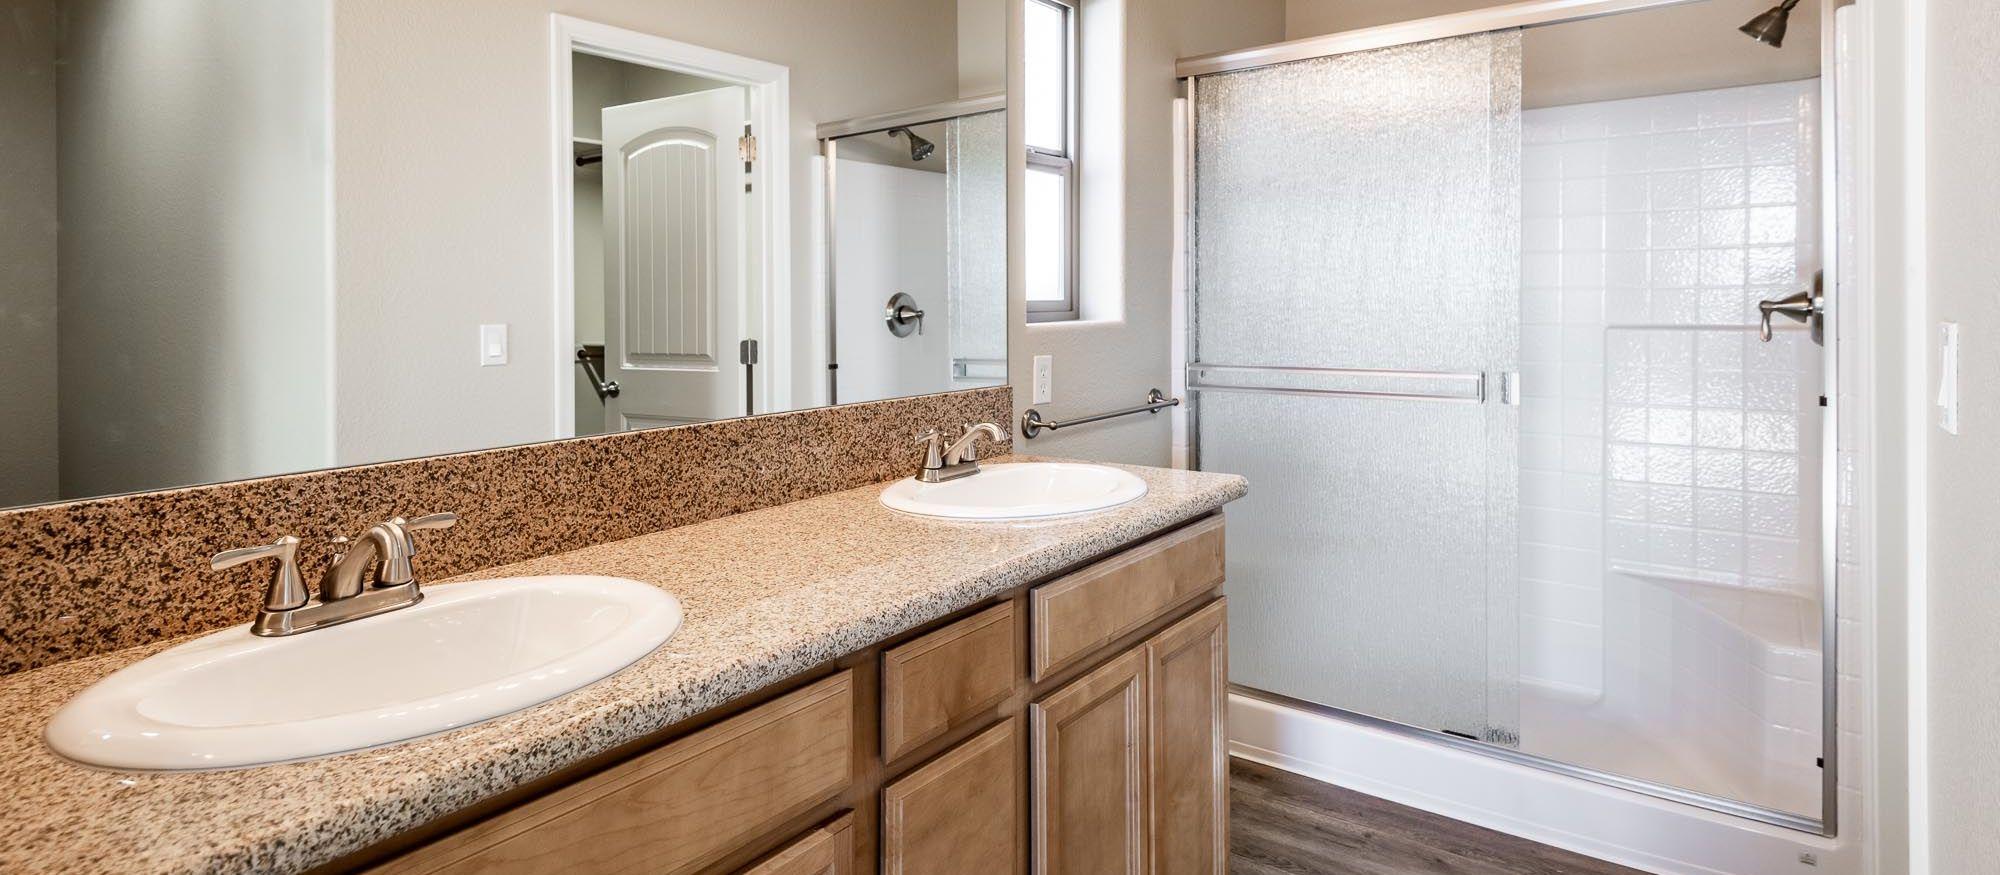 Bathroom featured in the Ironwood 1593 By Angle Homes in Kingman-Lake Havasu City, AZ